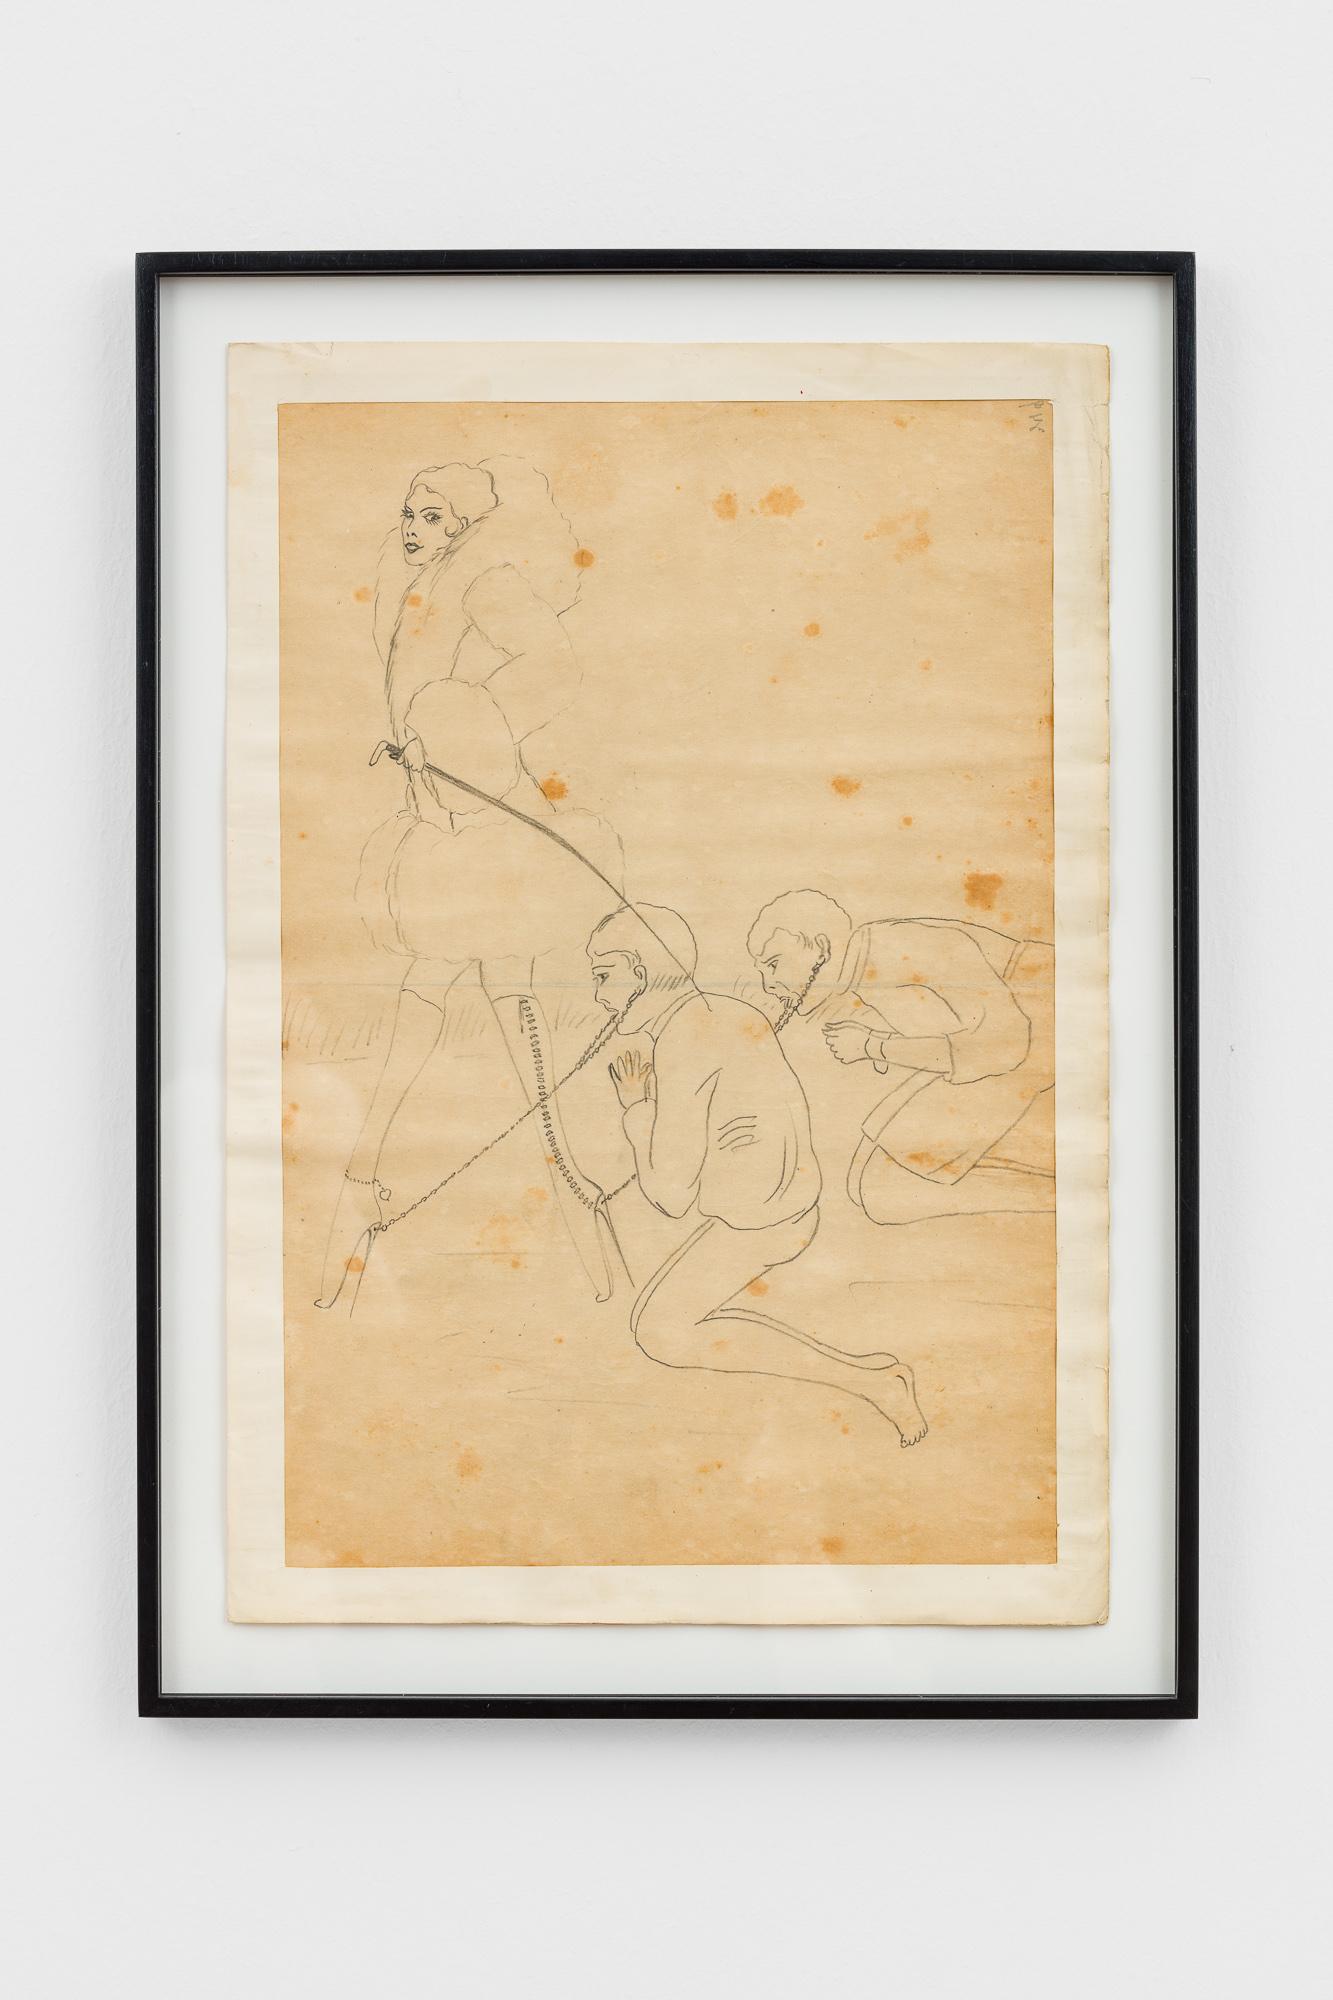 2018_11_22_Reproduktionen_Zoe Barcza & Soshiro Matsubara at Croy Nielsen by kunstdokumentationcom_003_web.jpg